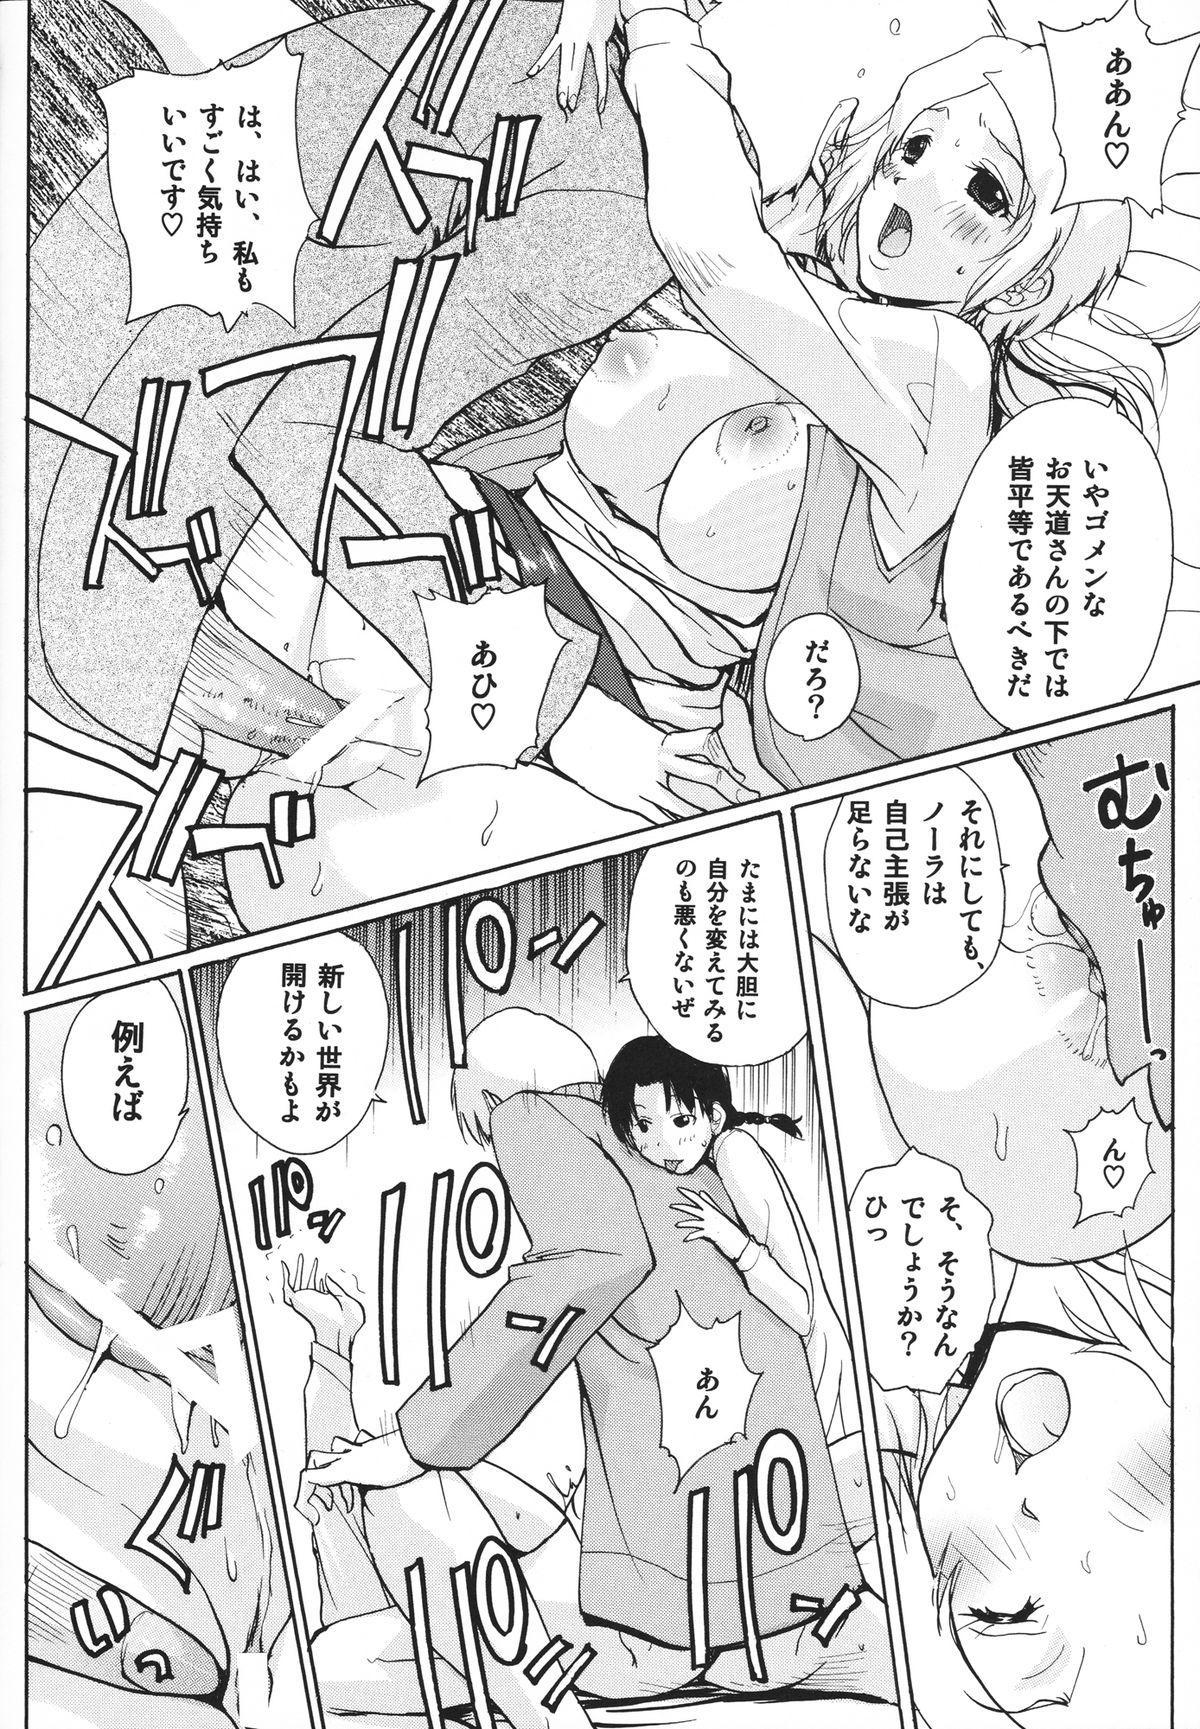 Ookami to Osage to Kohitsuji 10